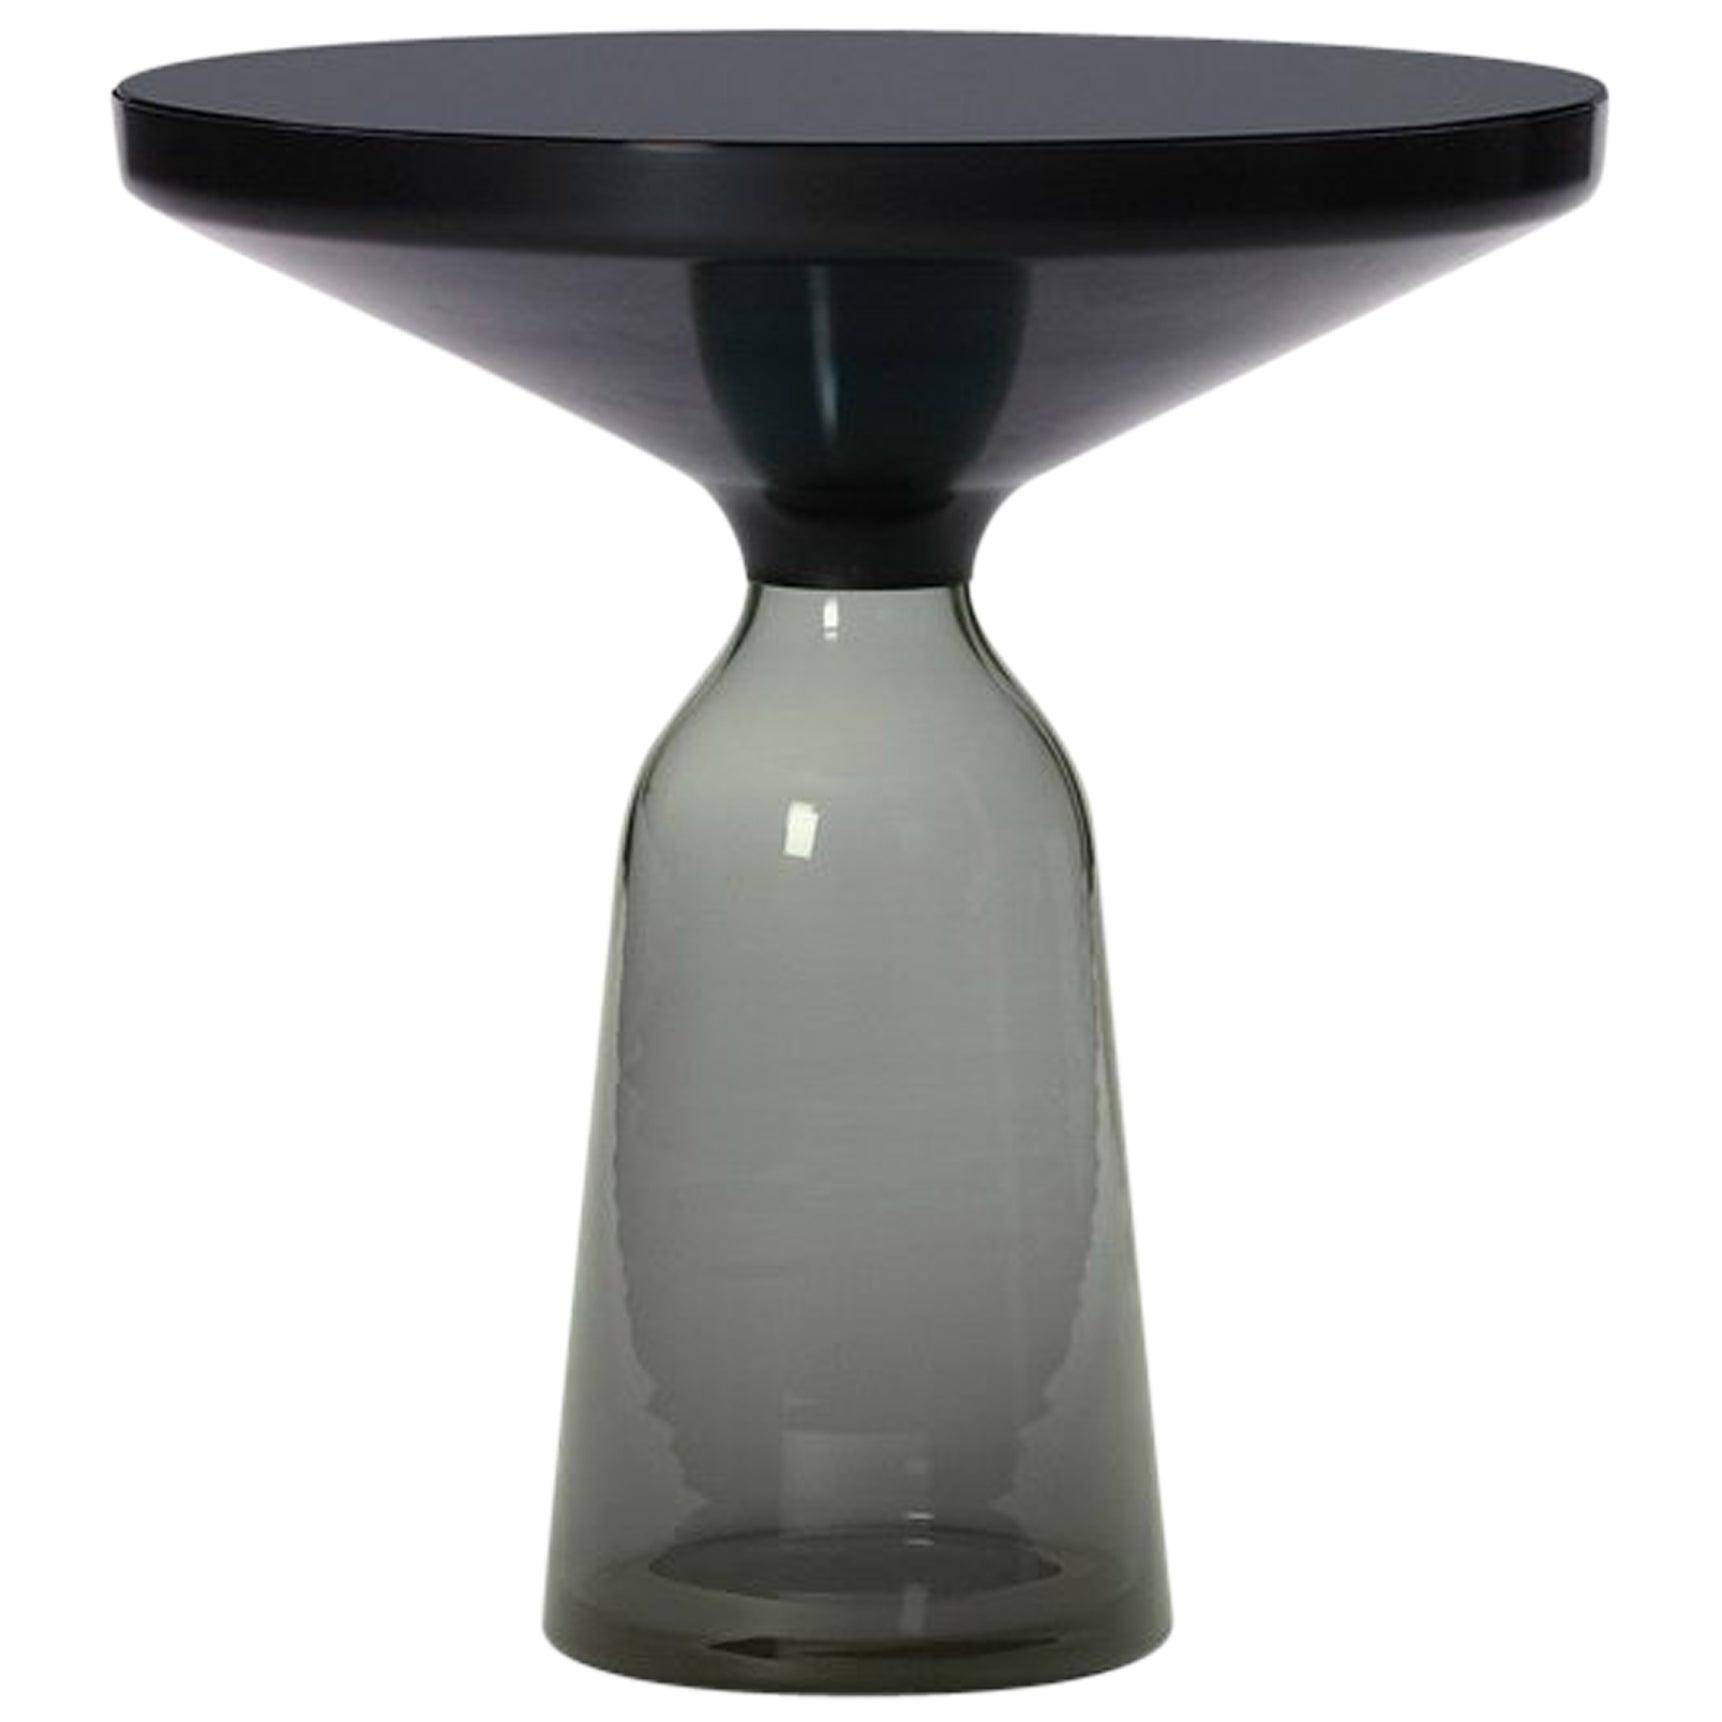 ClassiCon Bell Side Table in Black and Quartz Grey by Sebastian Herkner